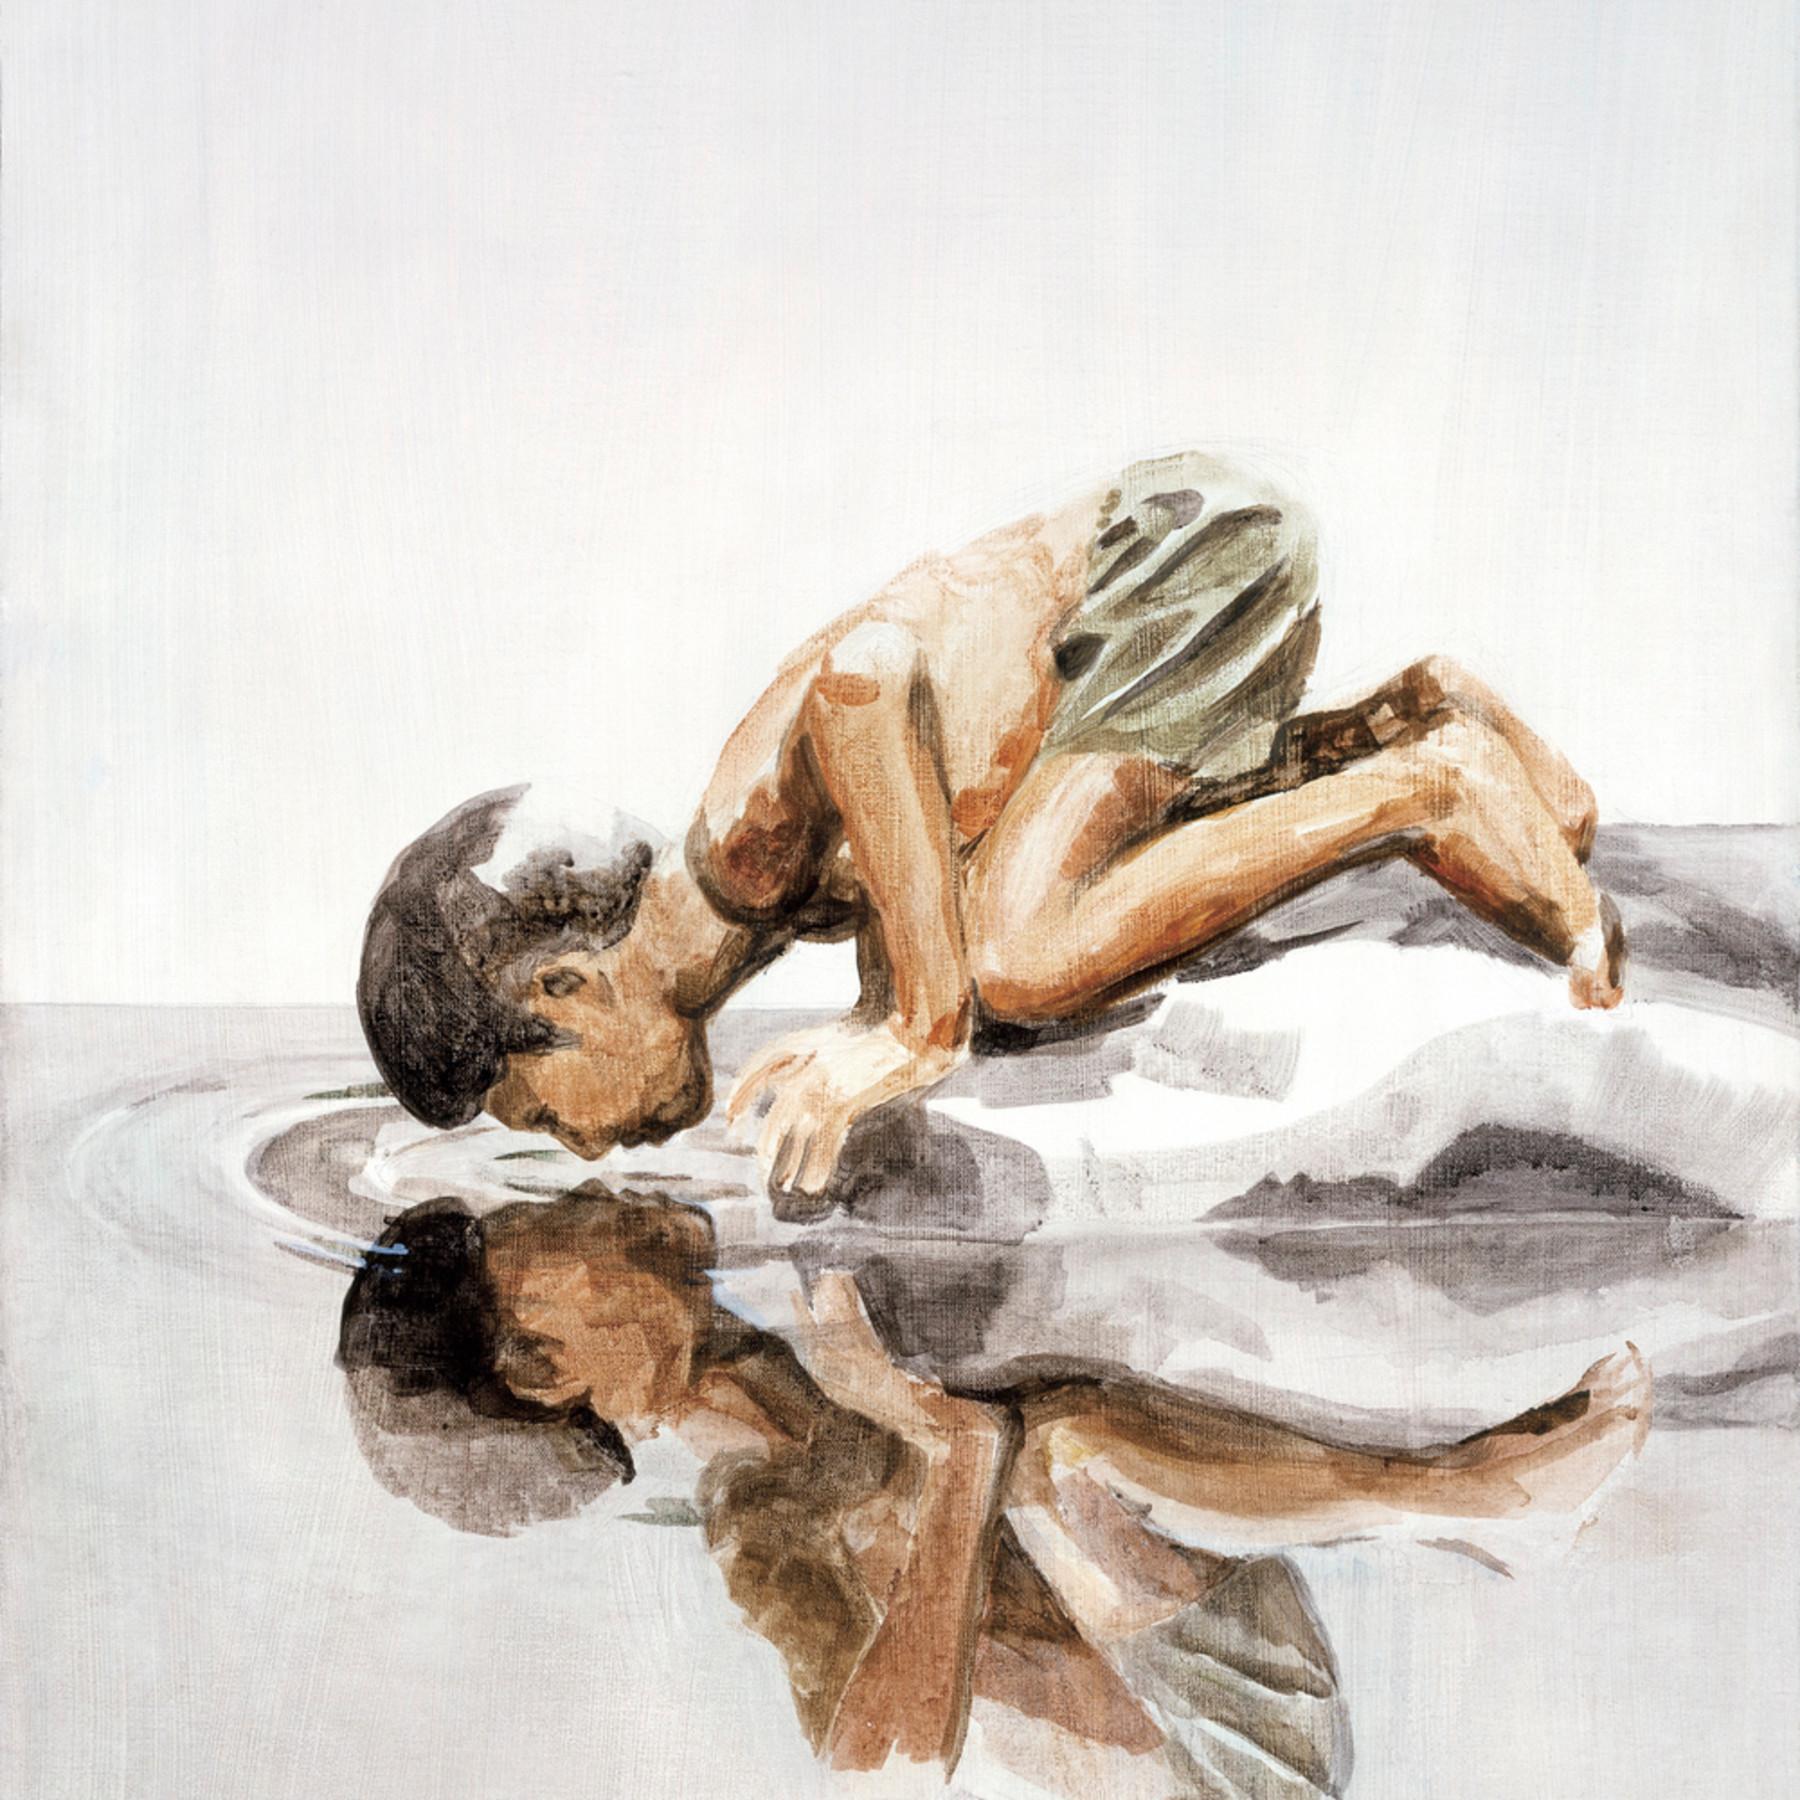 Self reflection amgssl